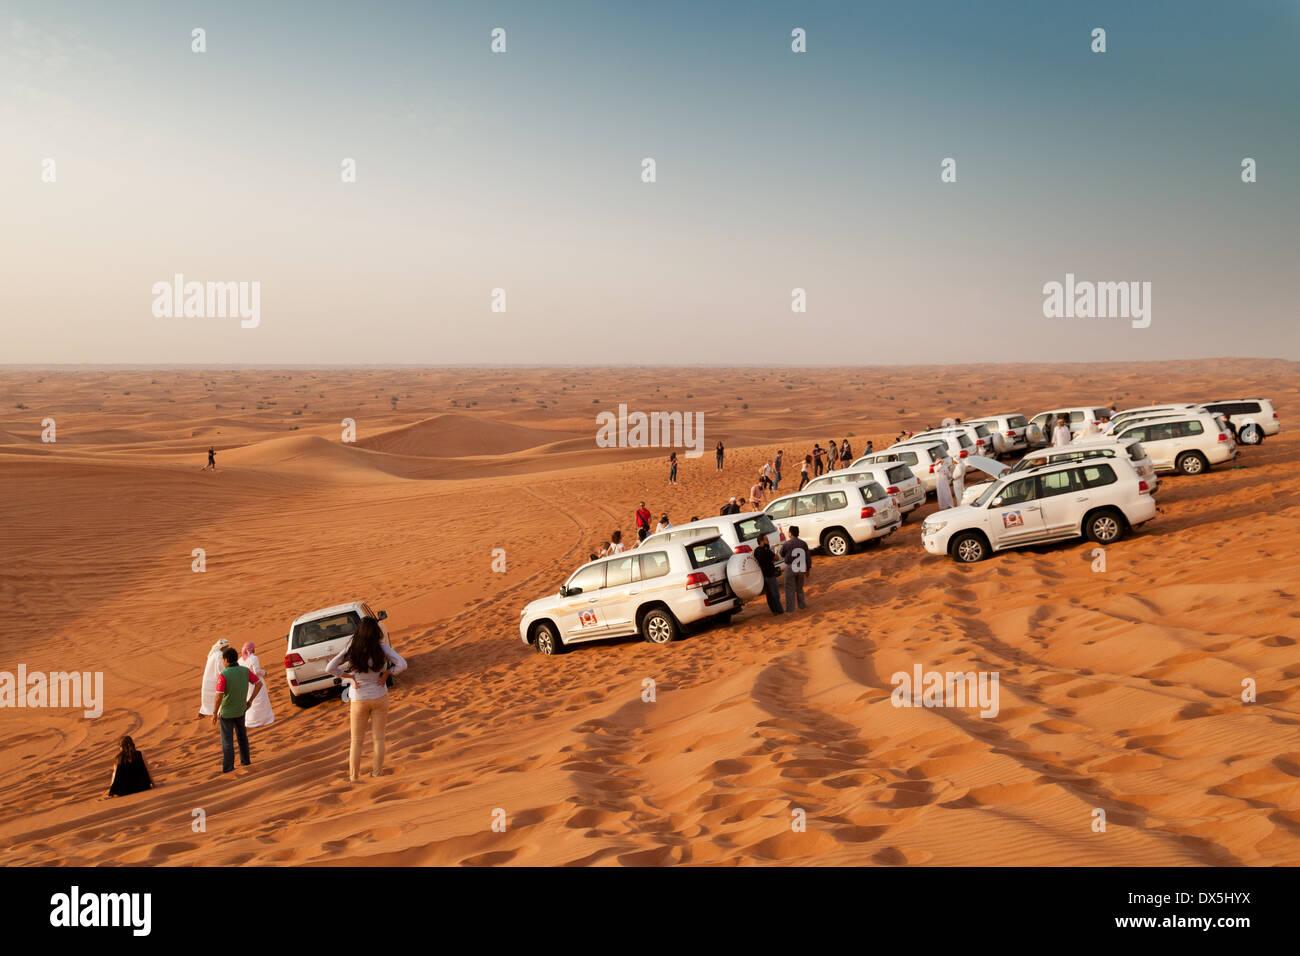 Group of 4 wheel drive cars on a desert safari tour, Dubai, Arabian desert, UAE, United Arab Emirates, Middle East - Stock Image